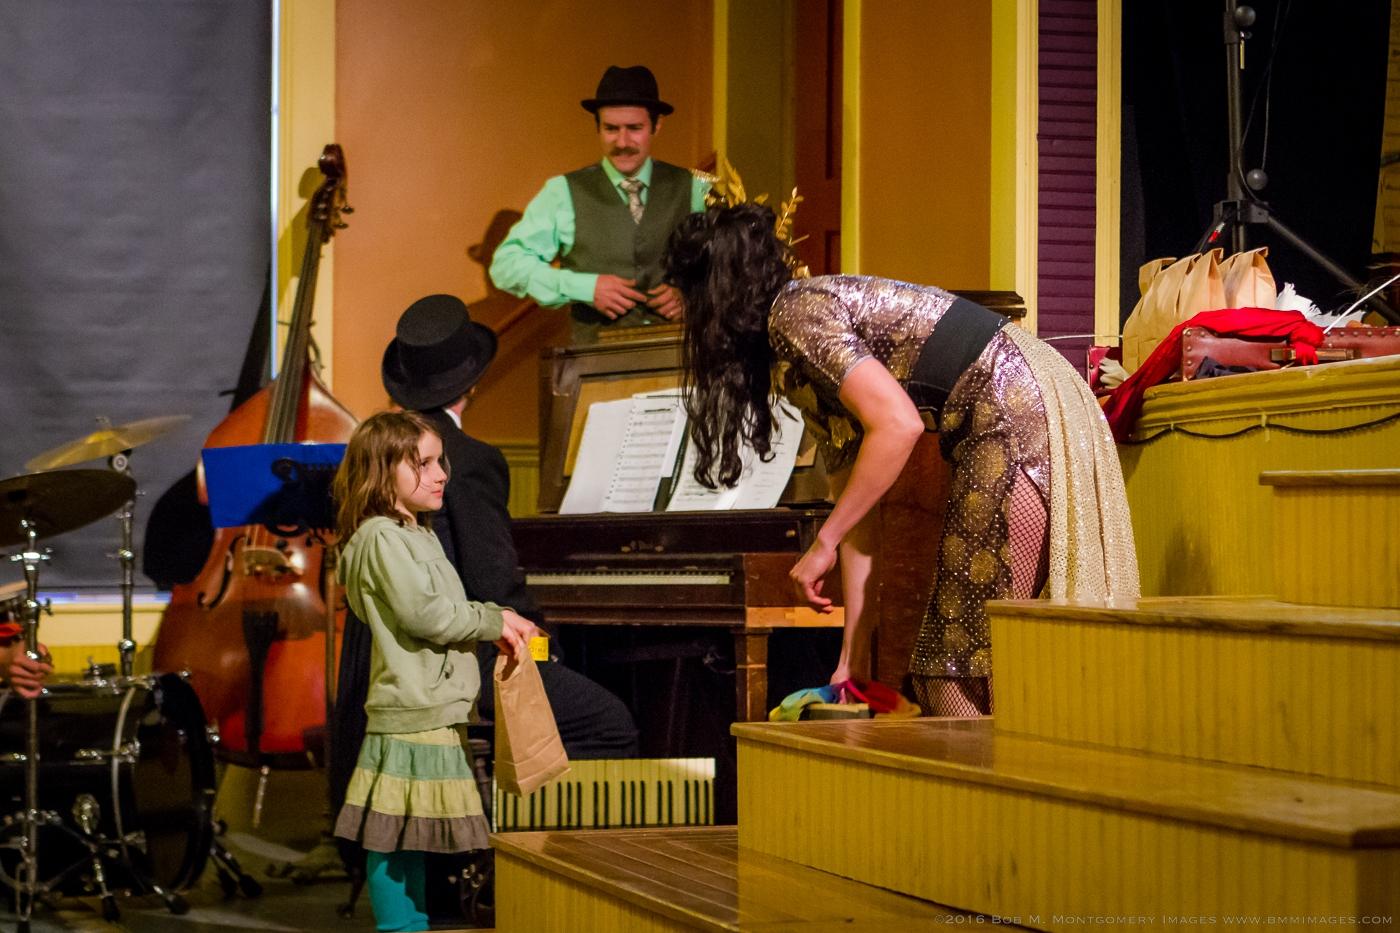 Vermont Vaudeville 20160513 - 0018.jpg